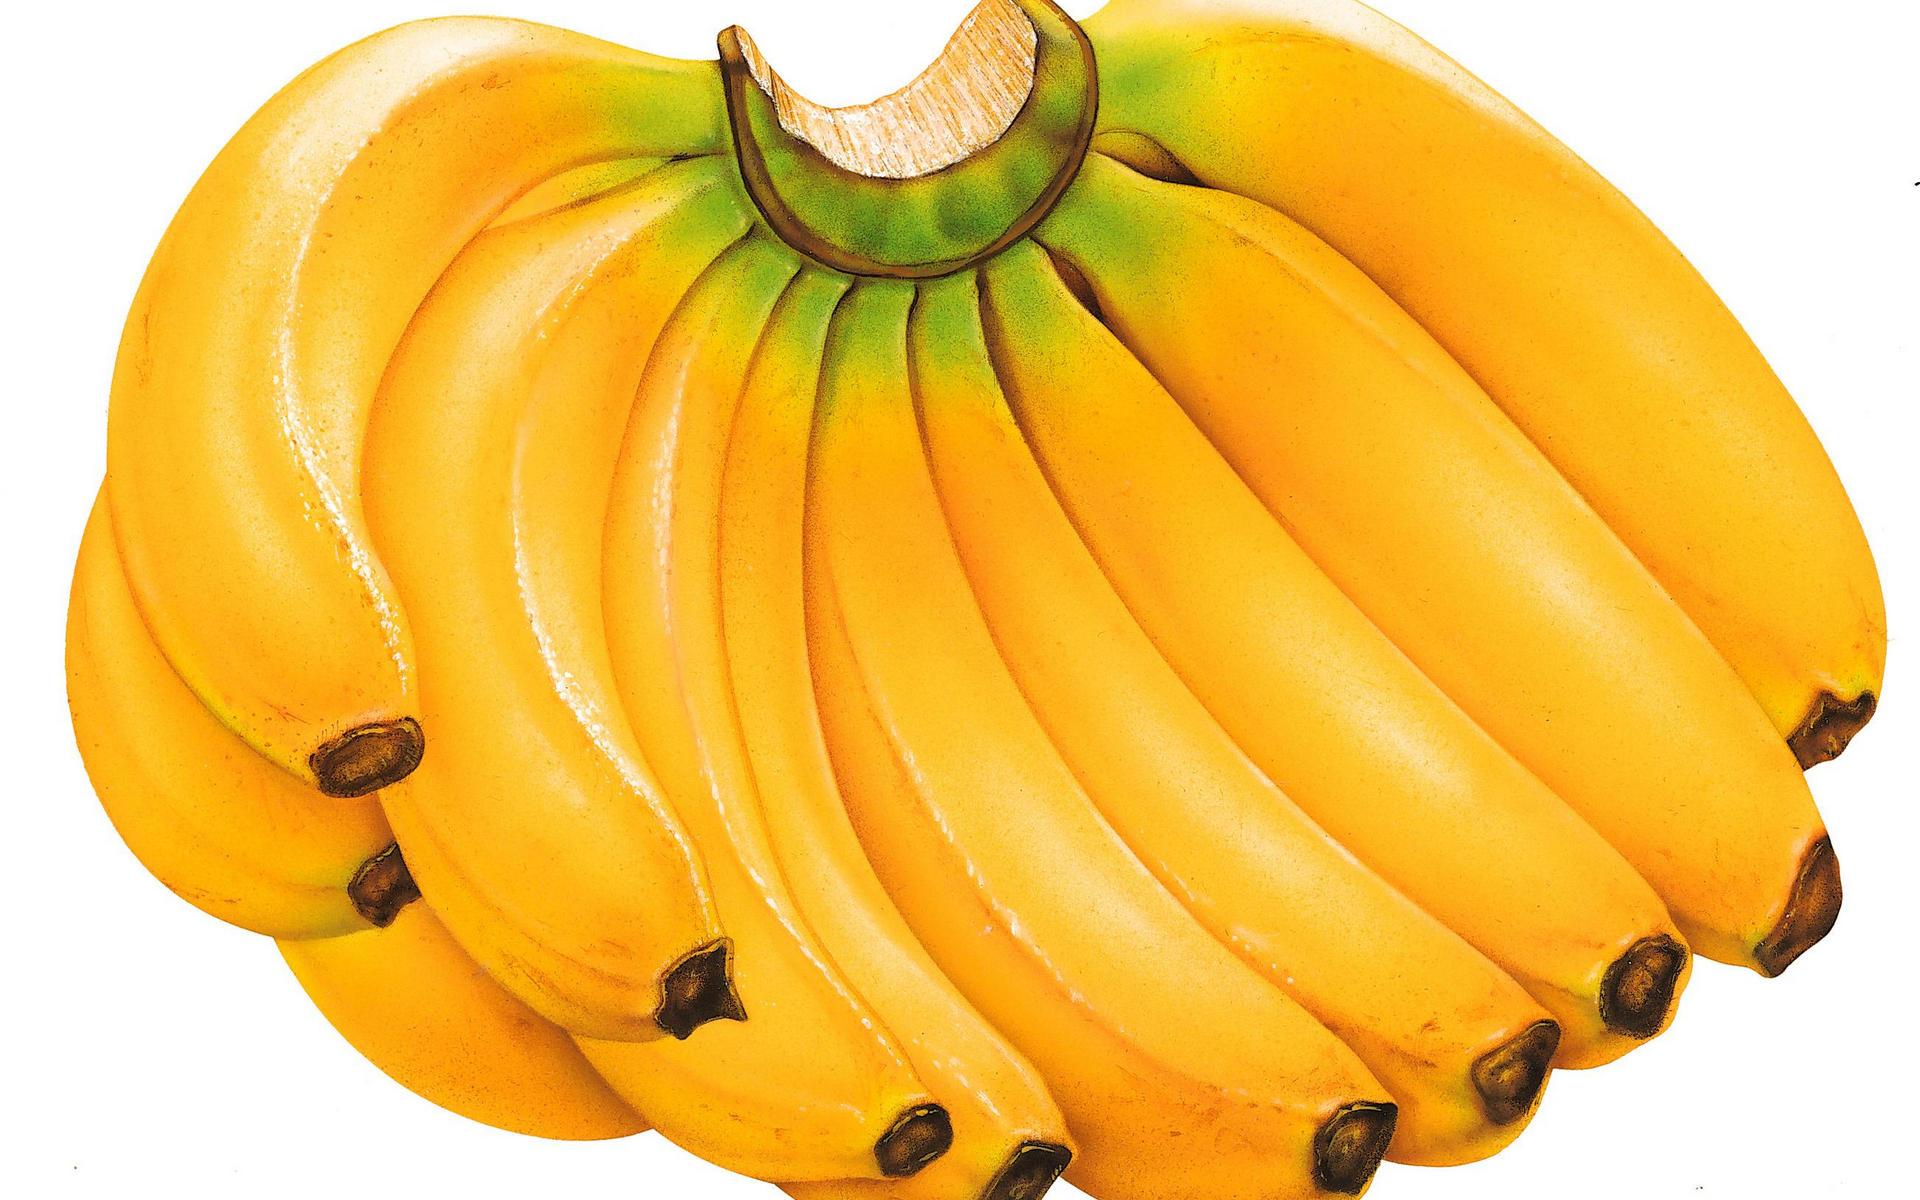 banana hd wallpaper | background image | 1920x1200 | id:367377